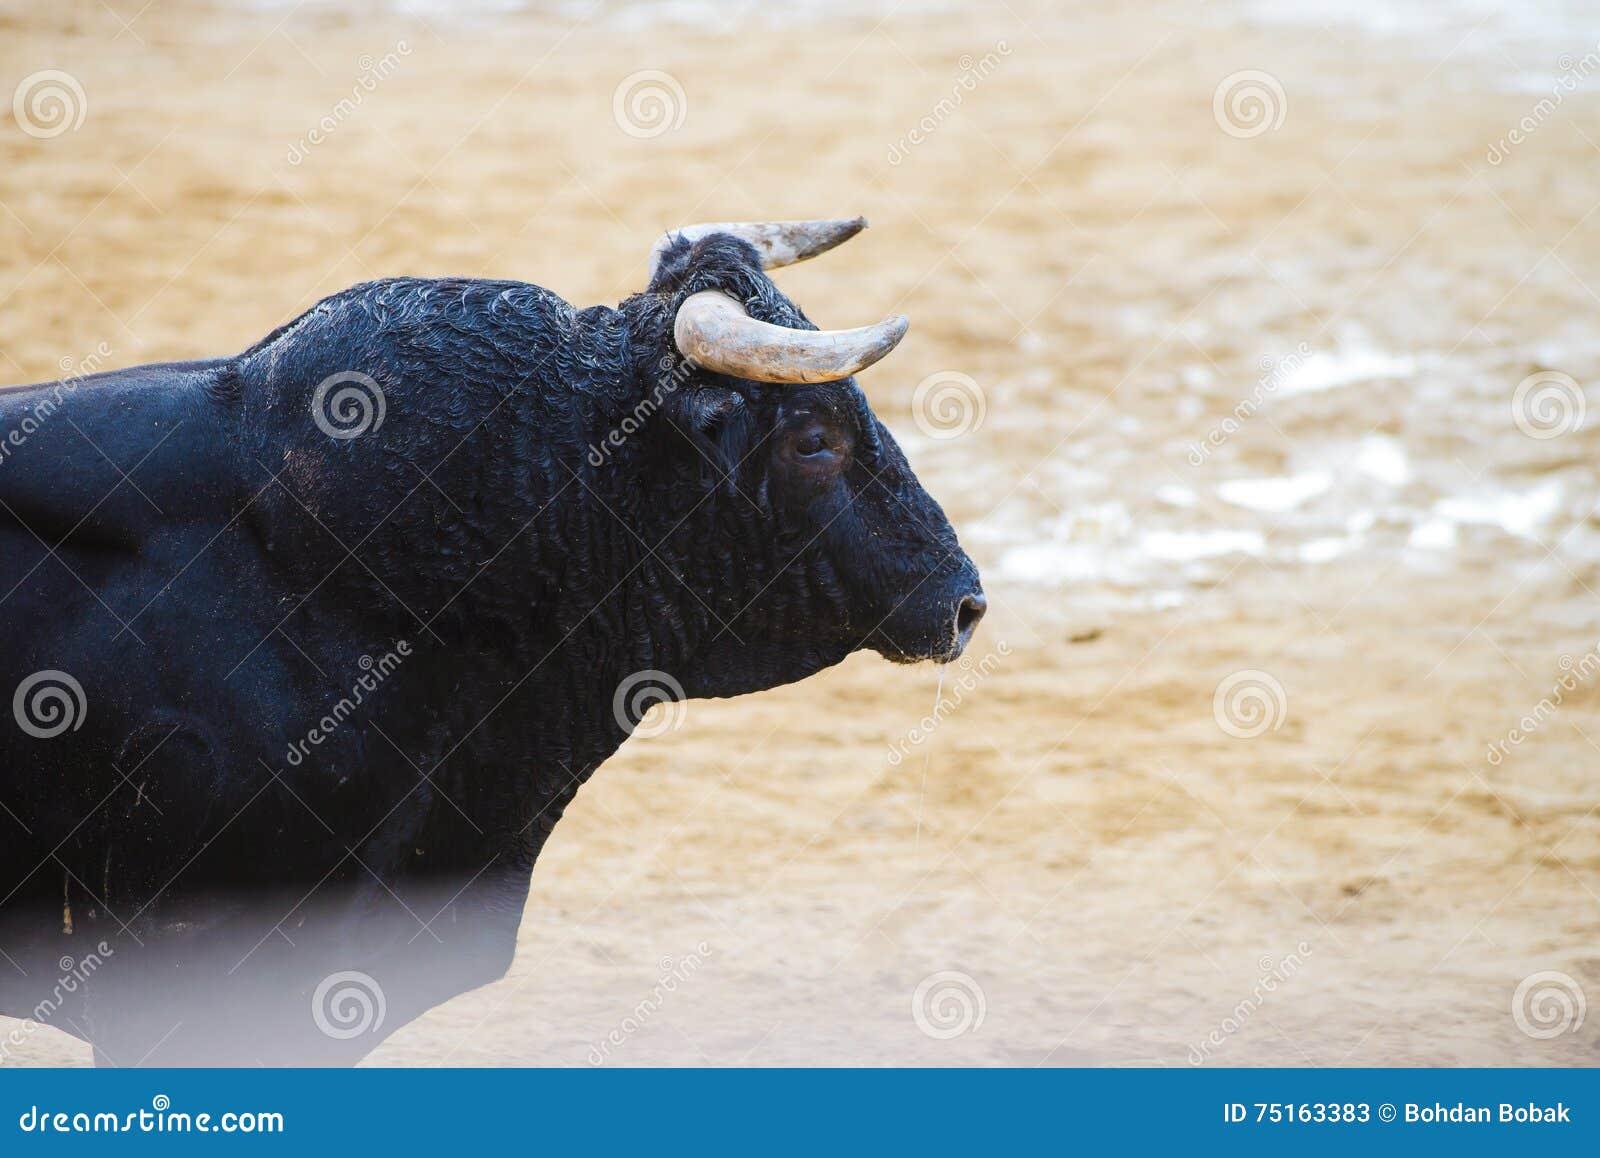 Bull από οι γενναίοι νεαροί άνδρες που πειράζει στο χώρο μετά από τους τρέχω-με-ο-ταύρους στις οδούς Denia, Ισπανία